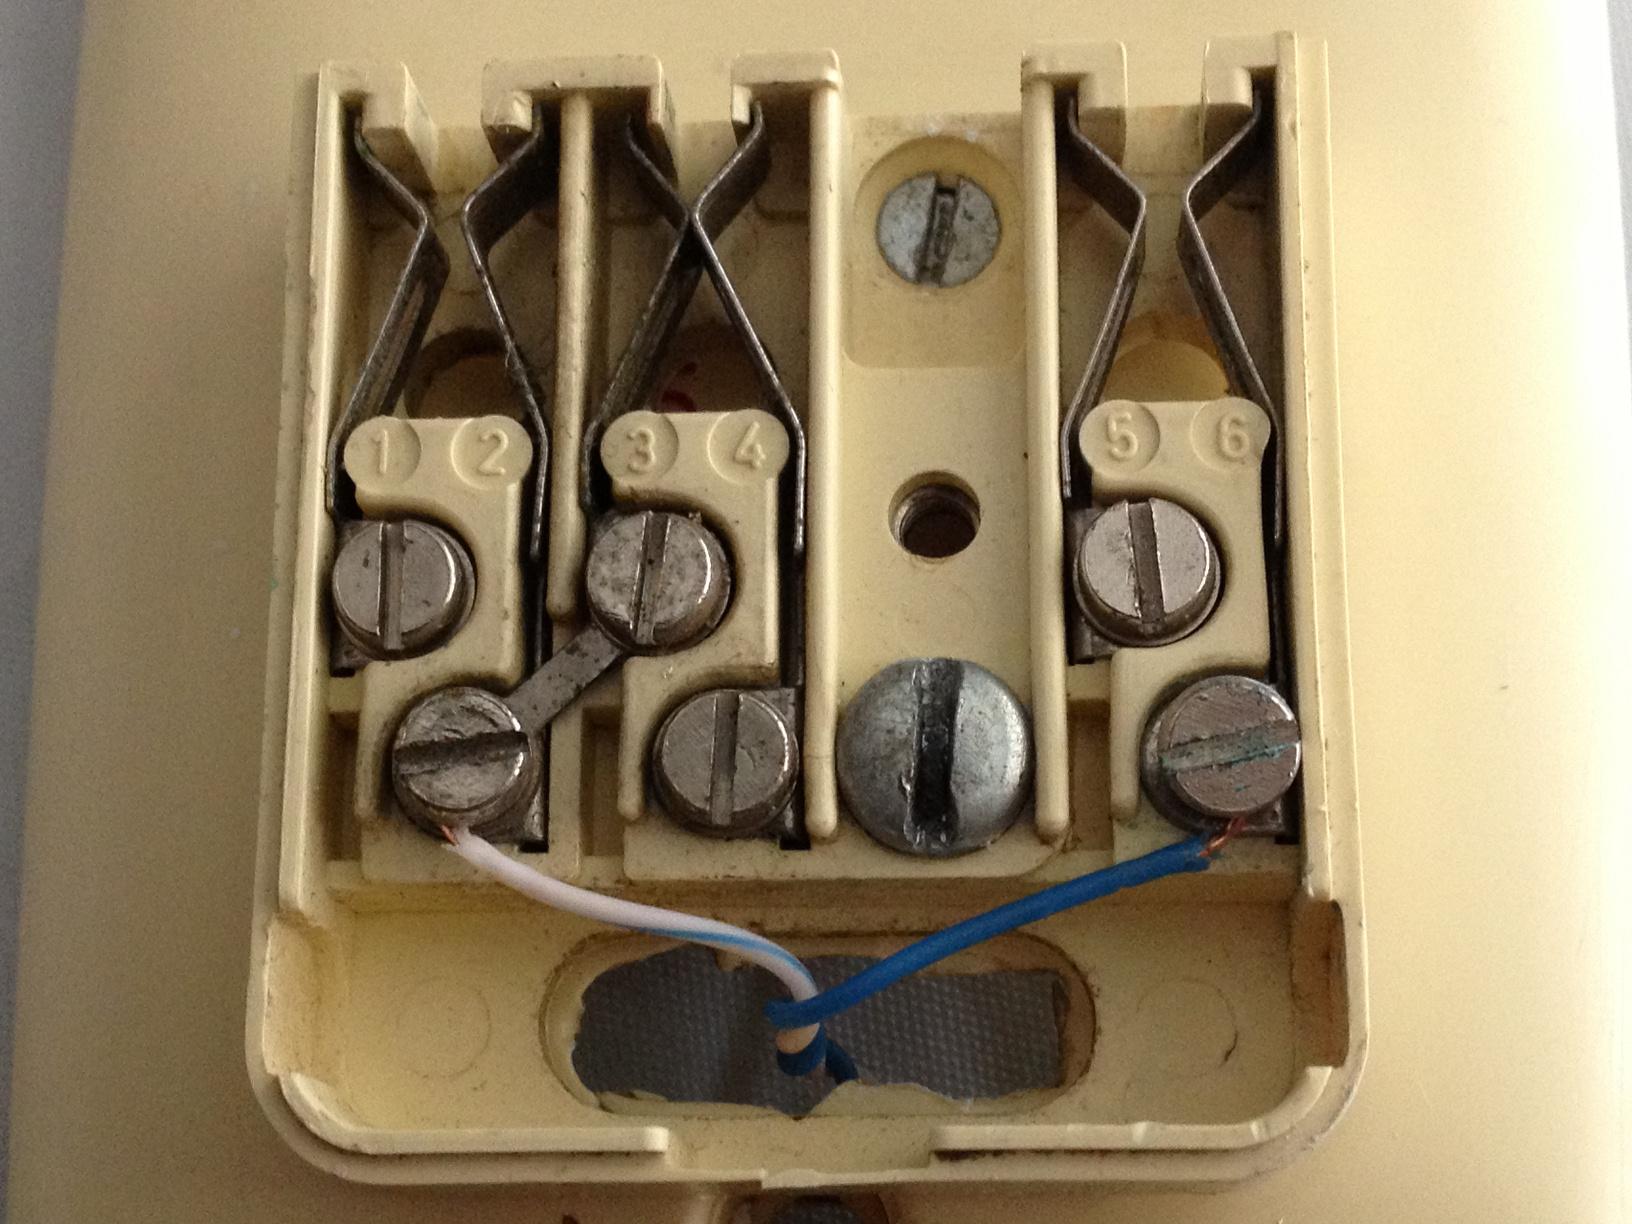 phone connection wiring diagram australia wiring diagram online wall outlet wiring diagram telephone socket wiring diagram australia [ 1632 x 1224 Pixel ]